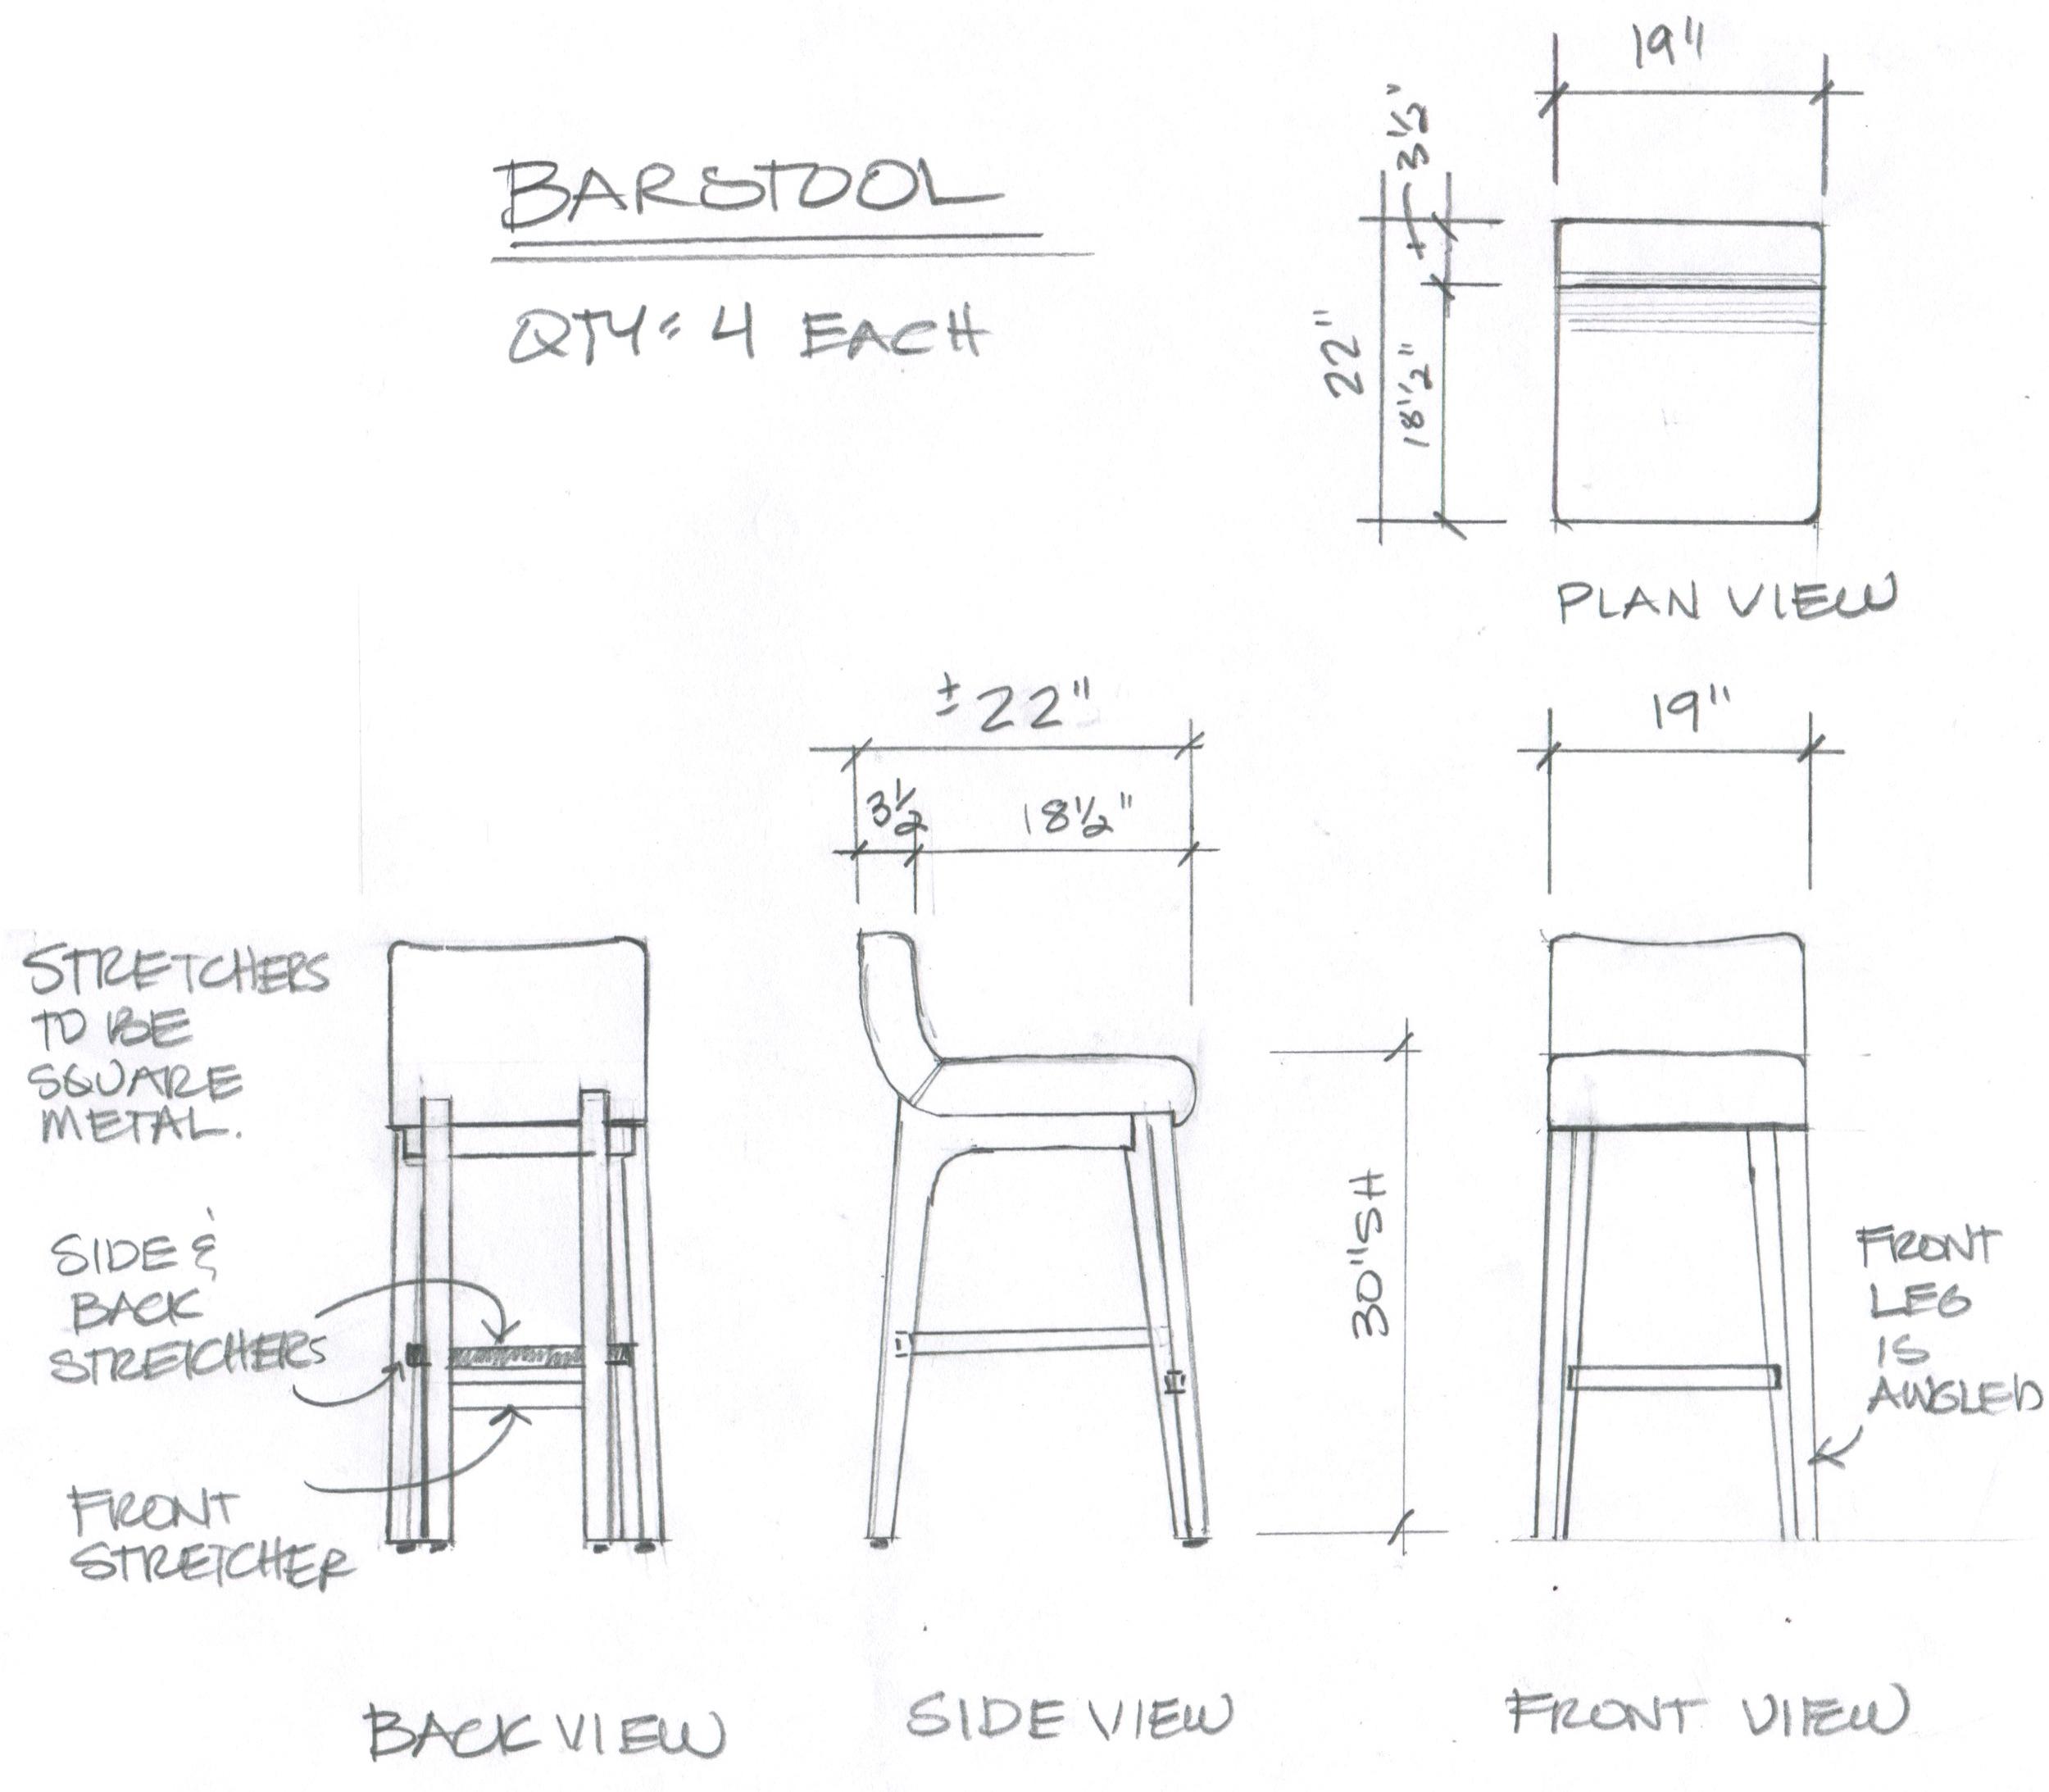 Matrix Sketch_Barstool.jpeg